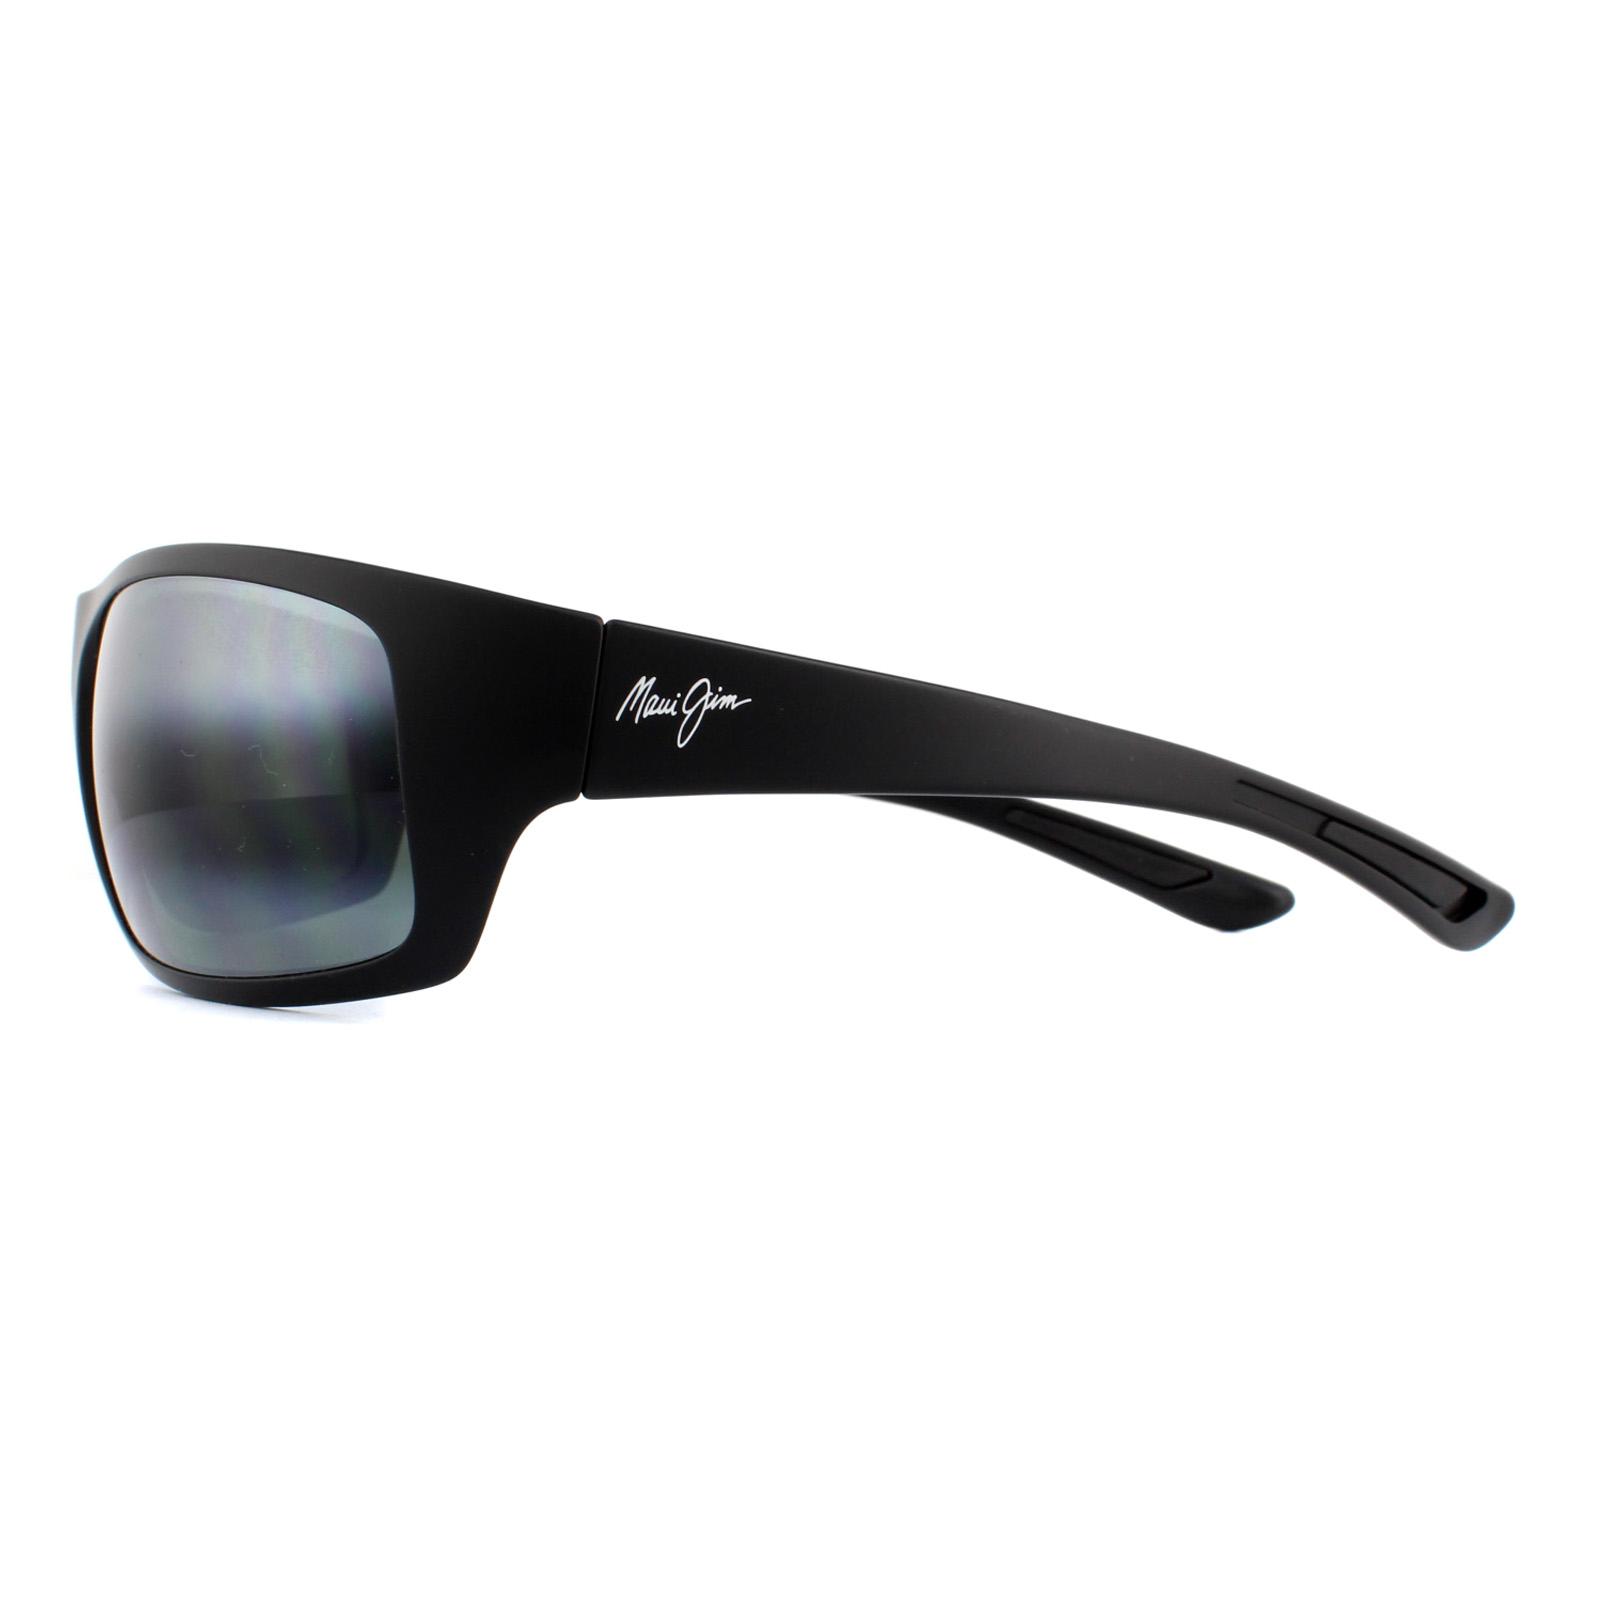 7d9e9c0e23d Sentinel Maui Jim Sunglasses Big Wave 440-2M Matte Black Neutral Grey  Polarized